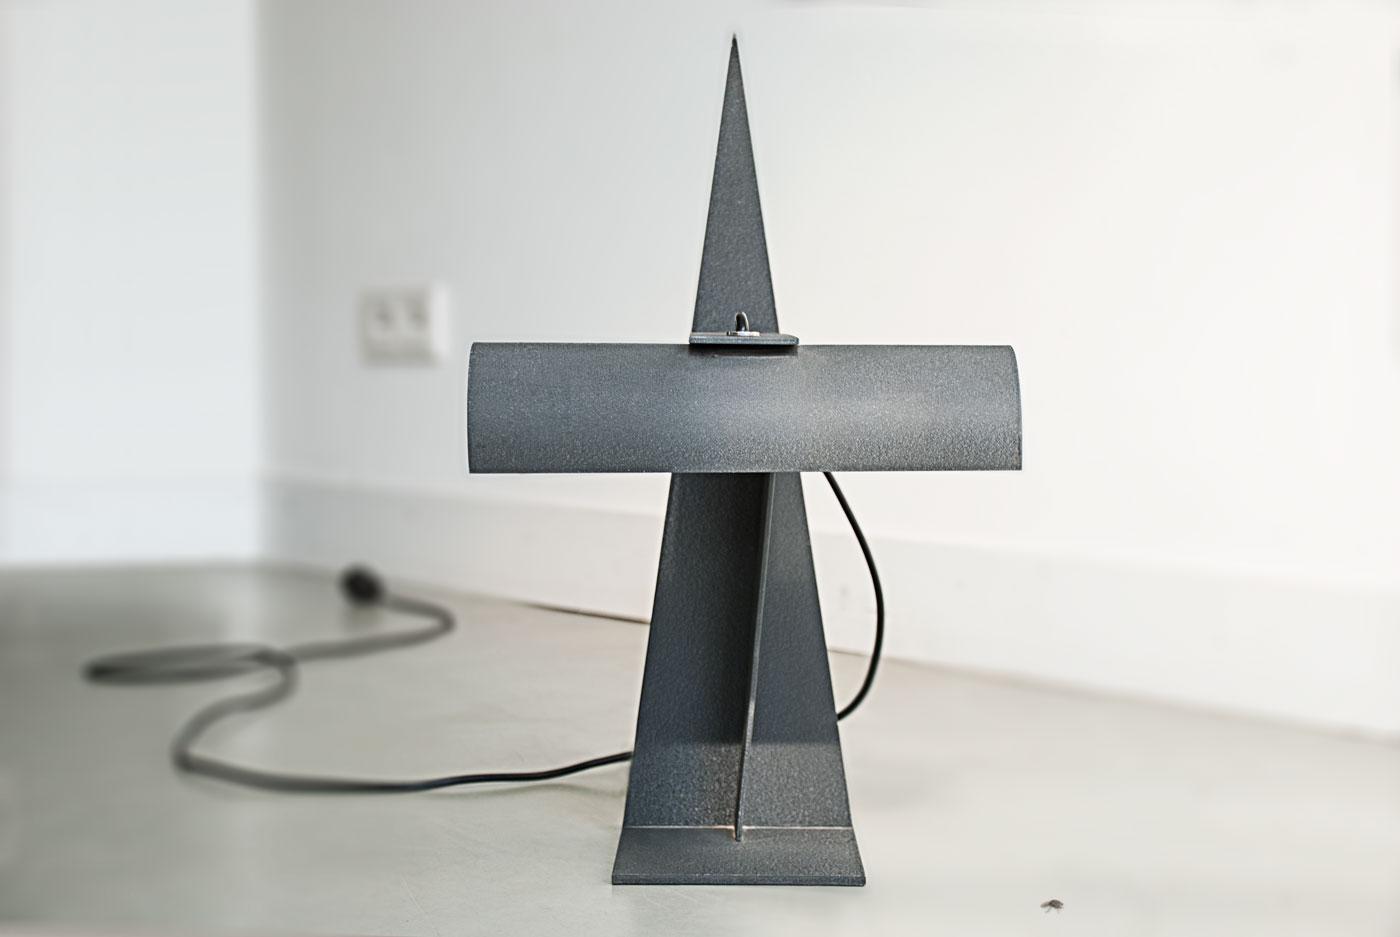 Tischlampe-Alexandr-Rodchenko-table-lamp